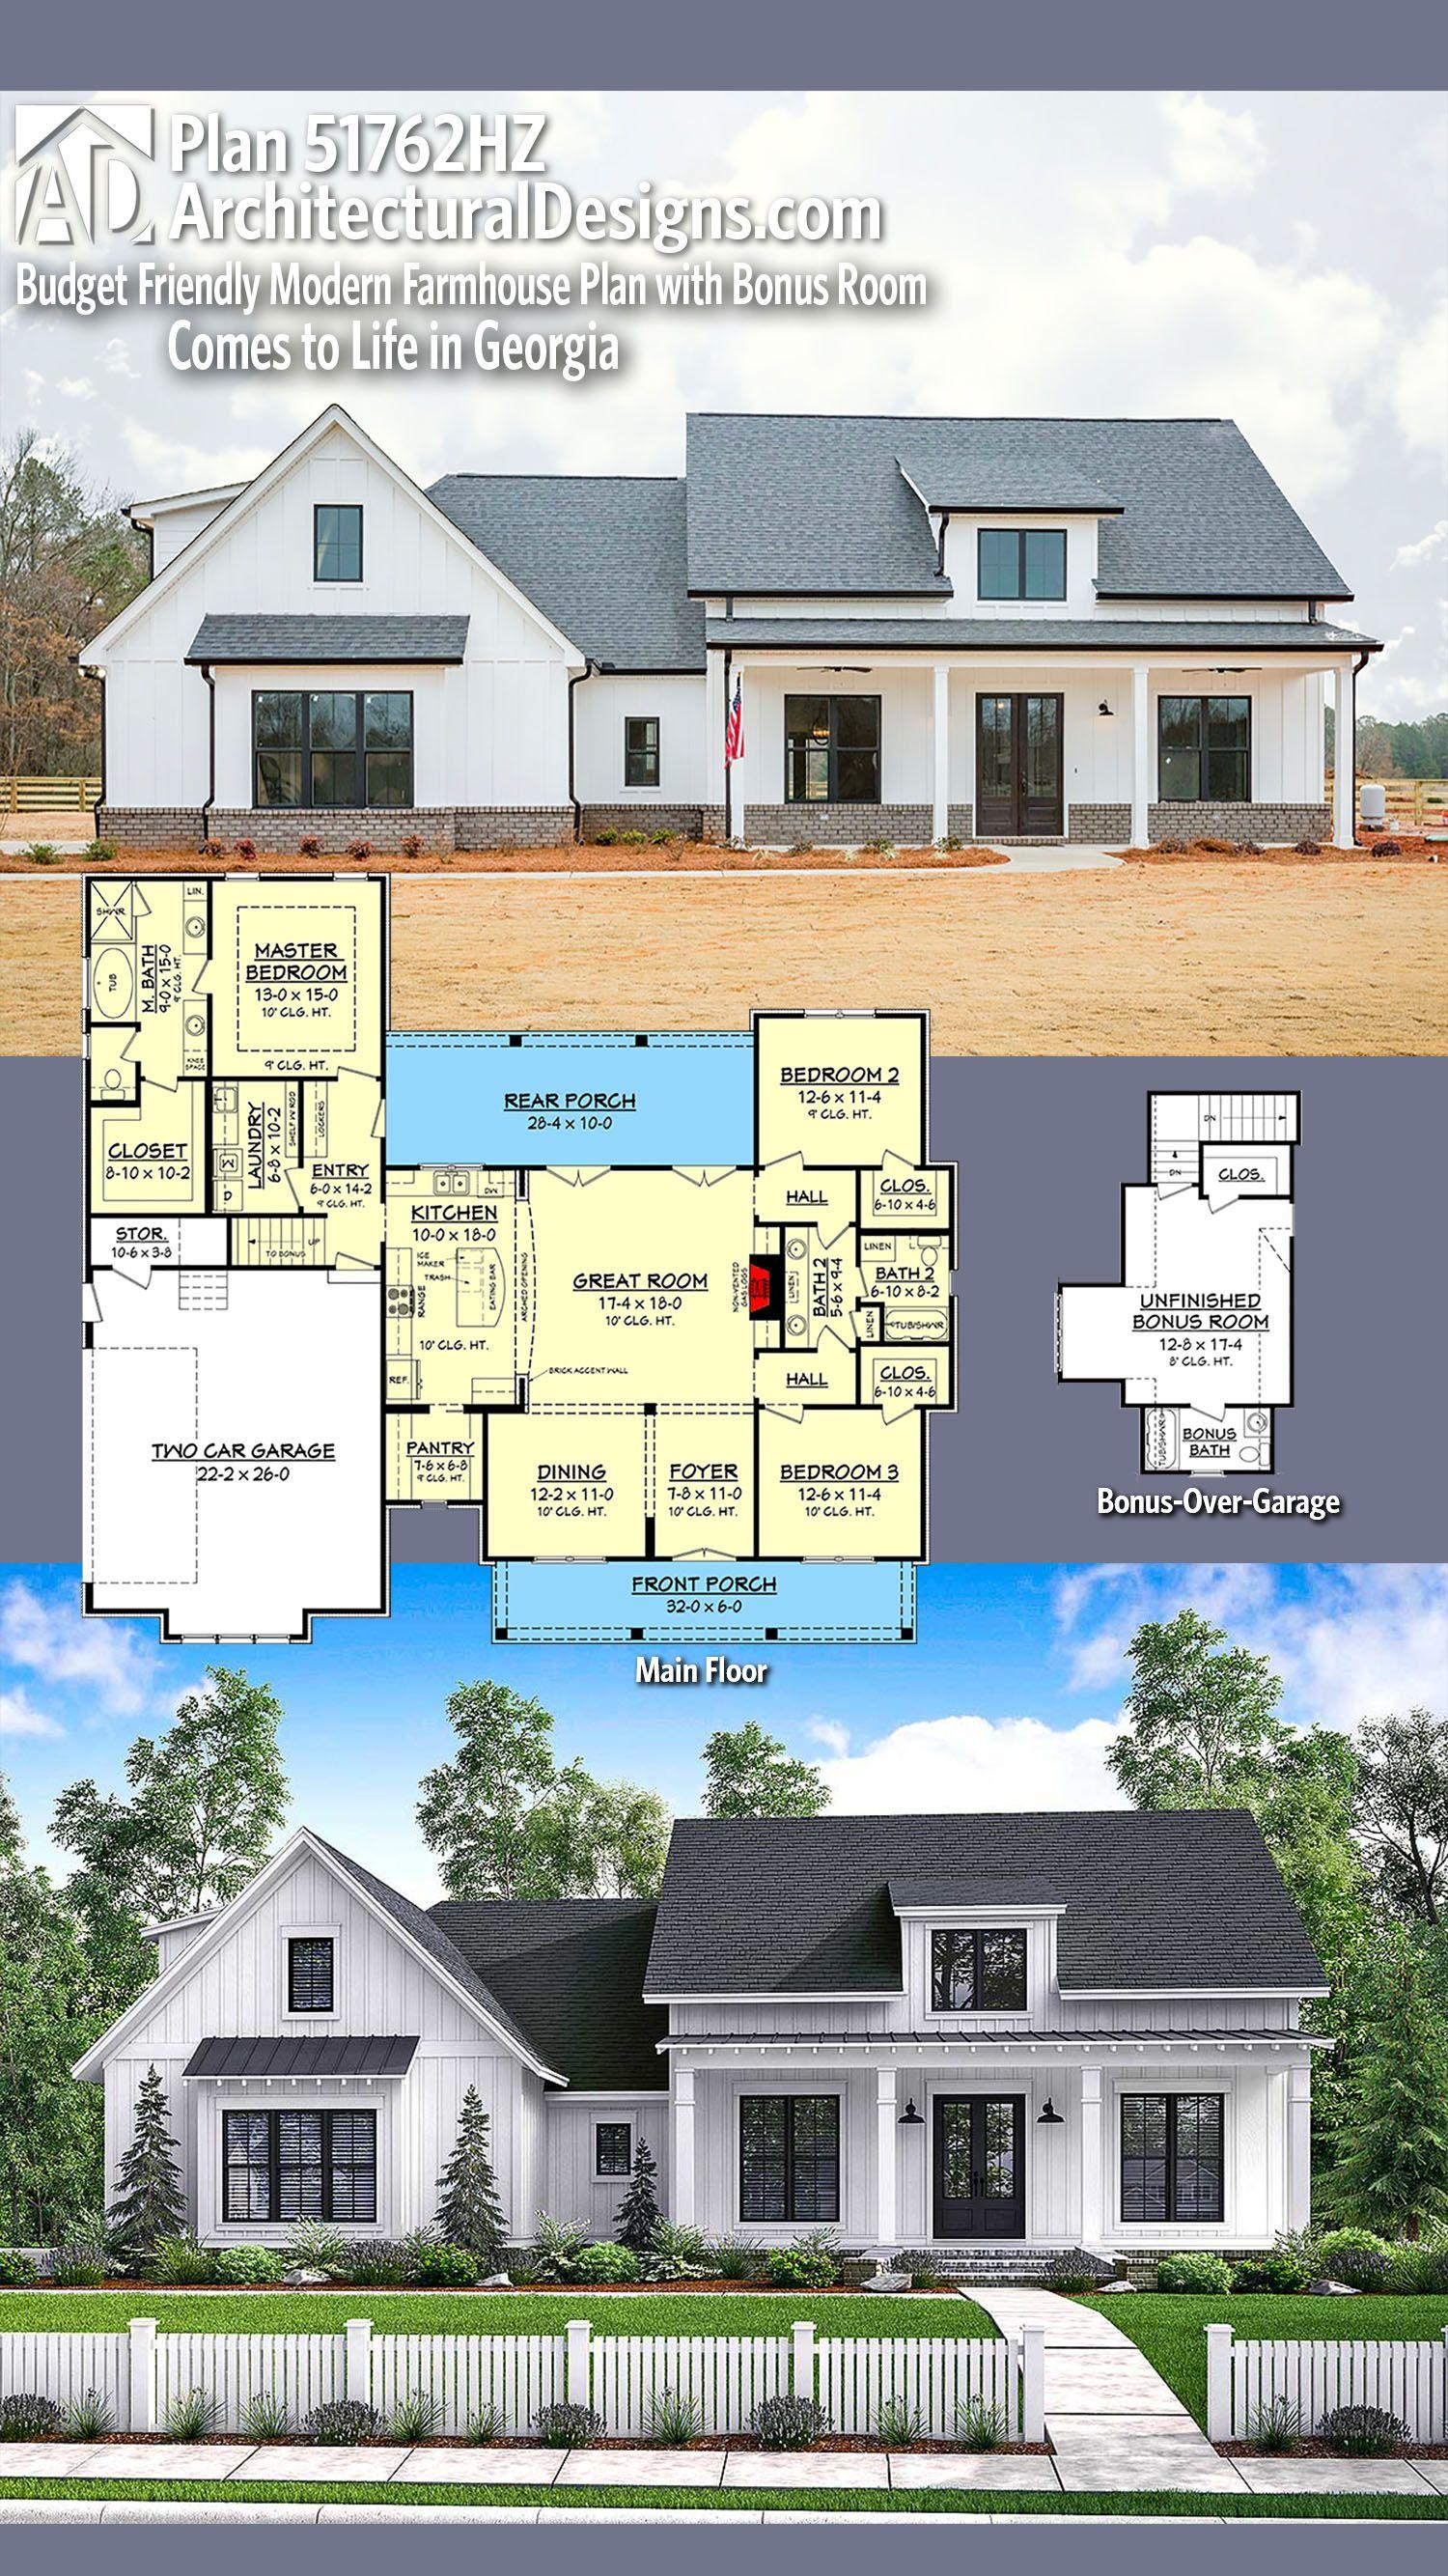 Plan 51762HZ Budget Friendly Modern Farmhouse Plan with